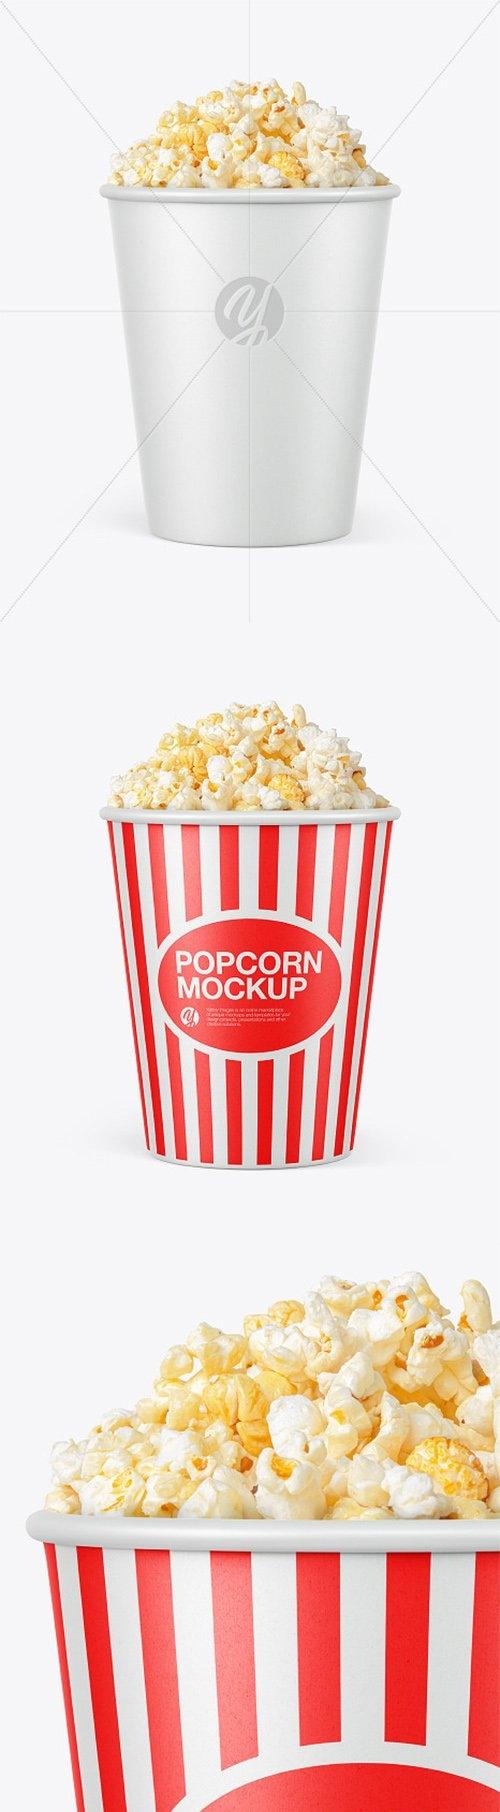 Cup Popcorn Mockup 66440